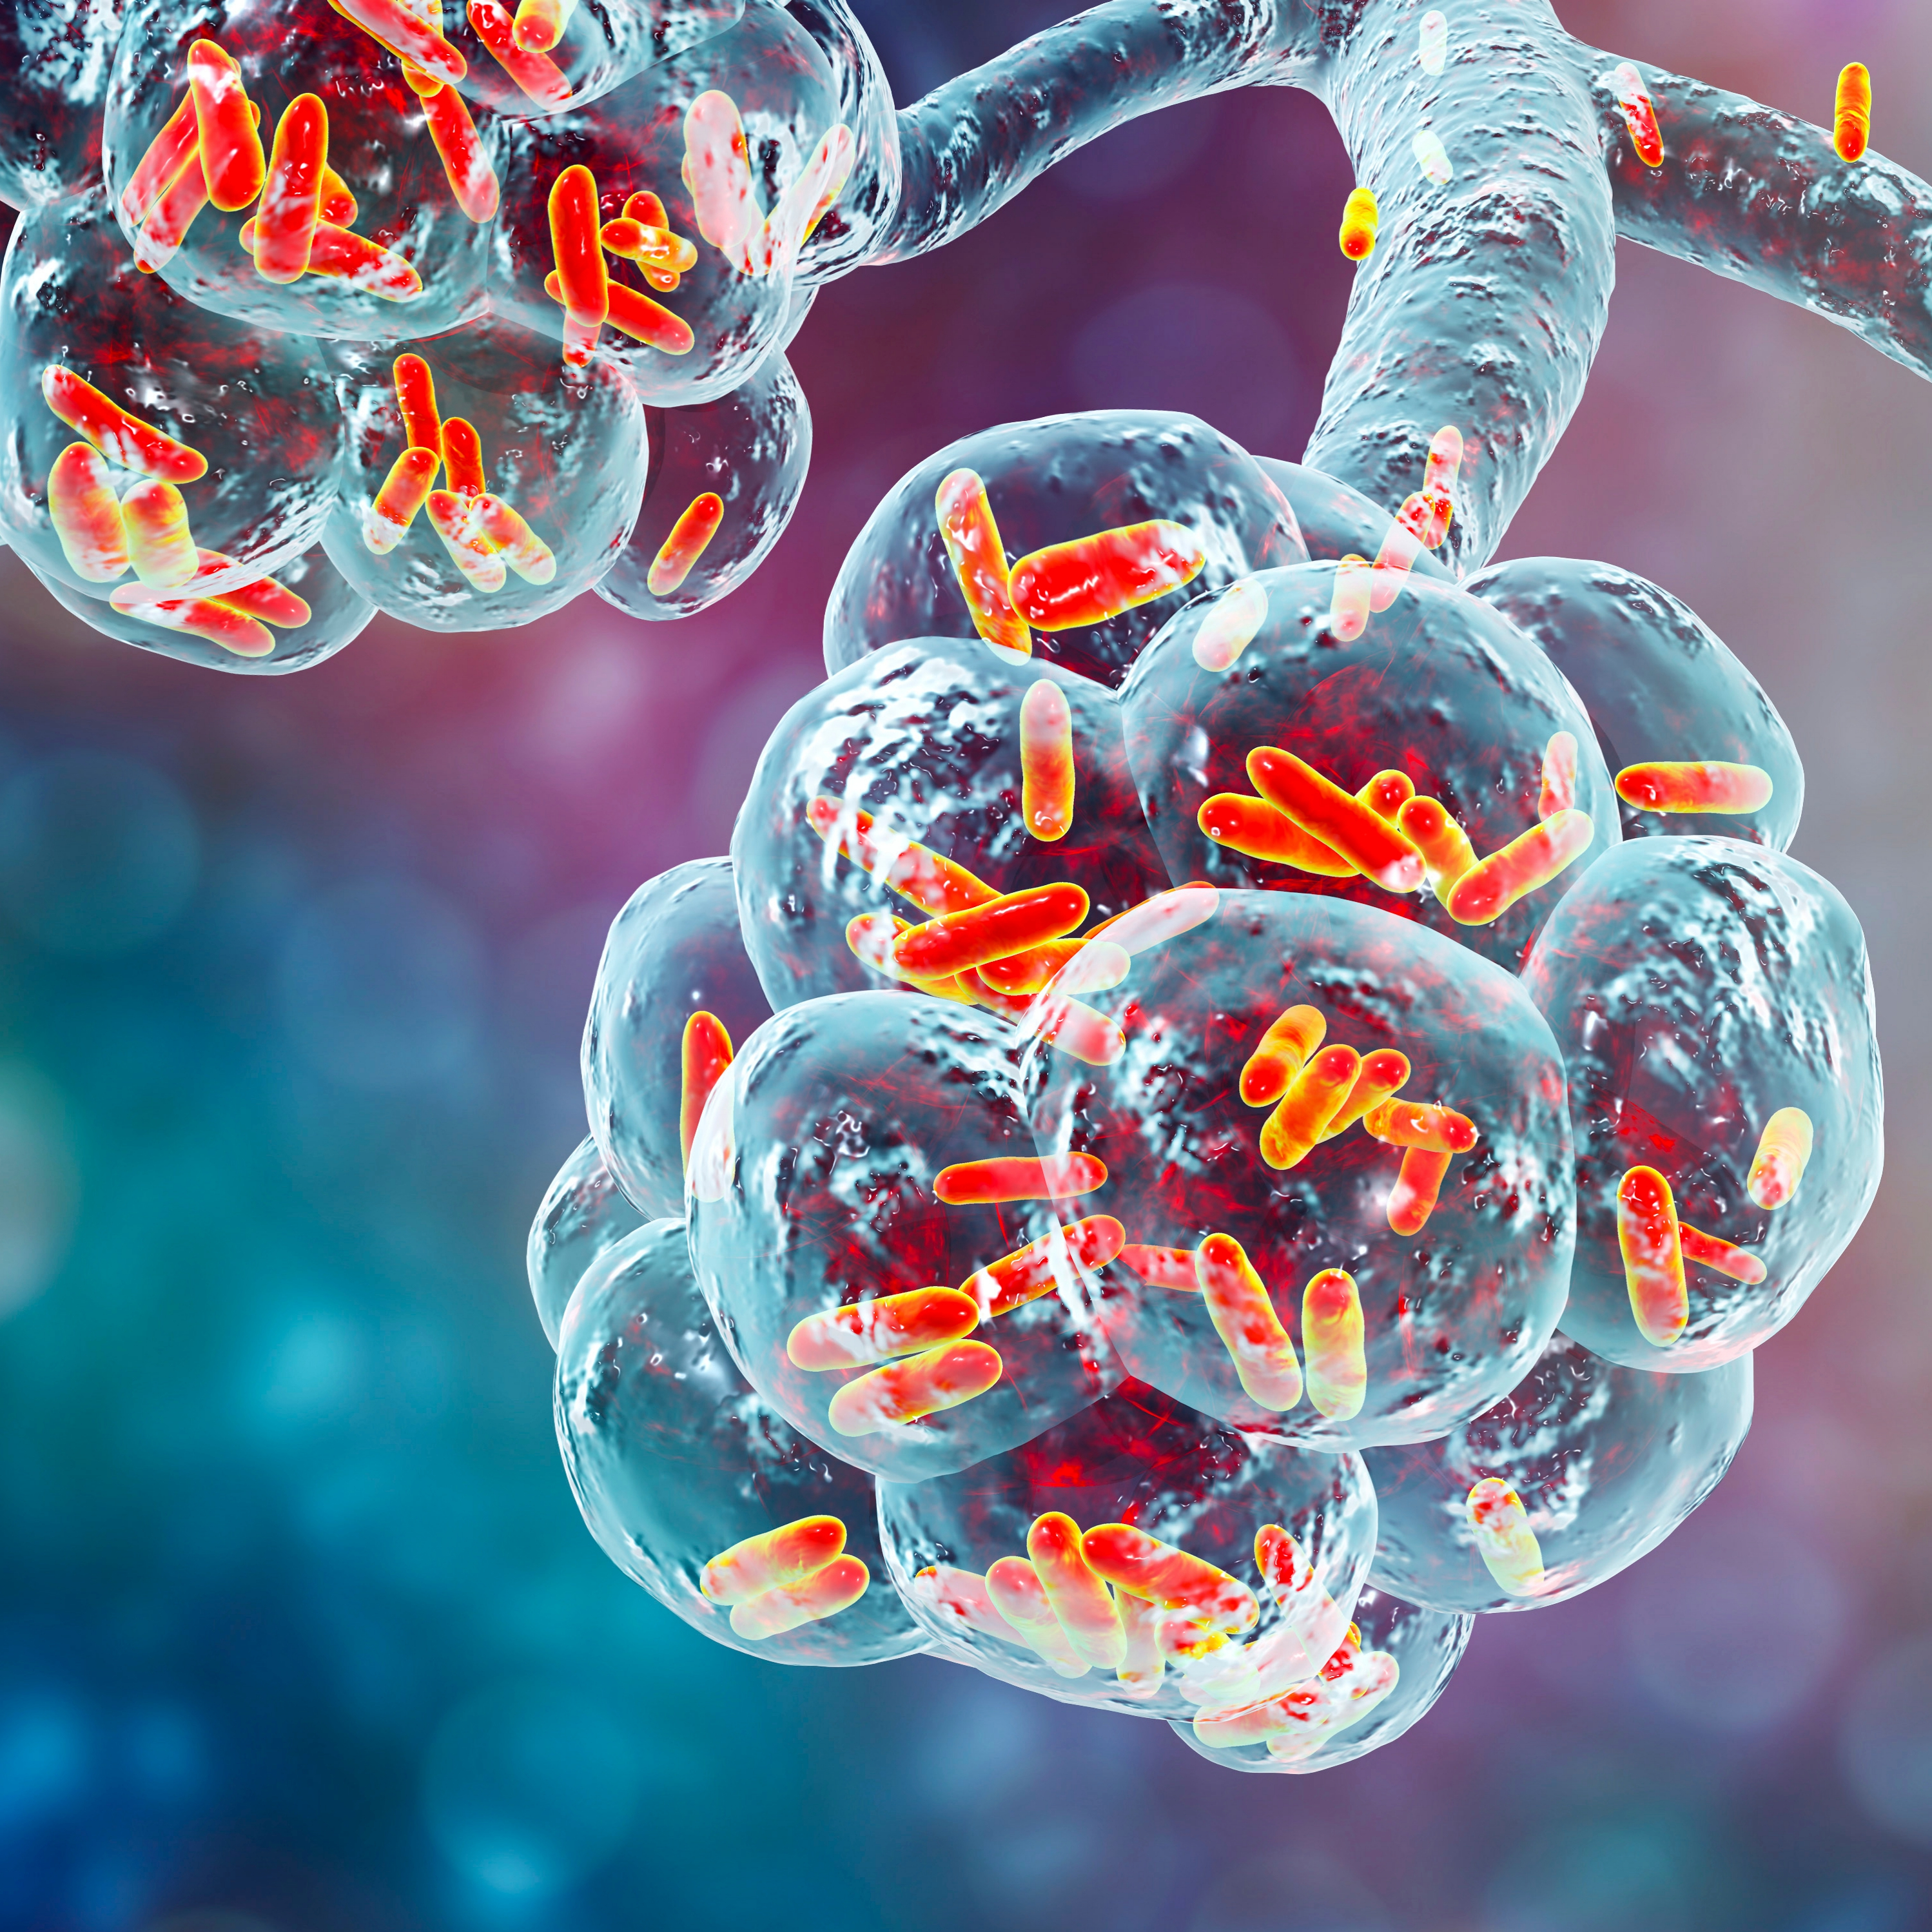 Bacterial pneumonia, medical concept. 3D illustration showing rod-shaped bacteria inside alveoli